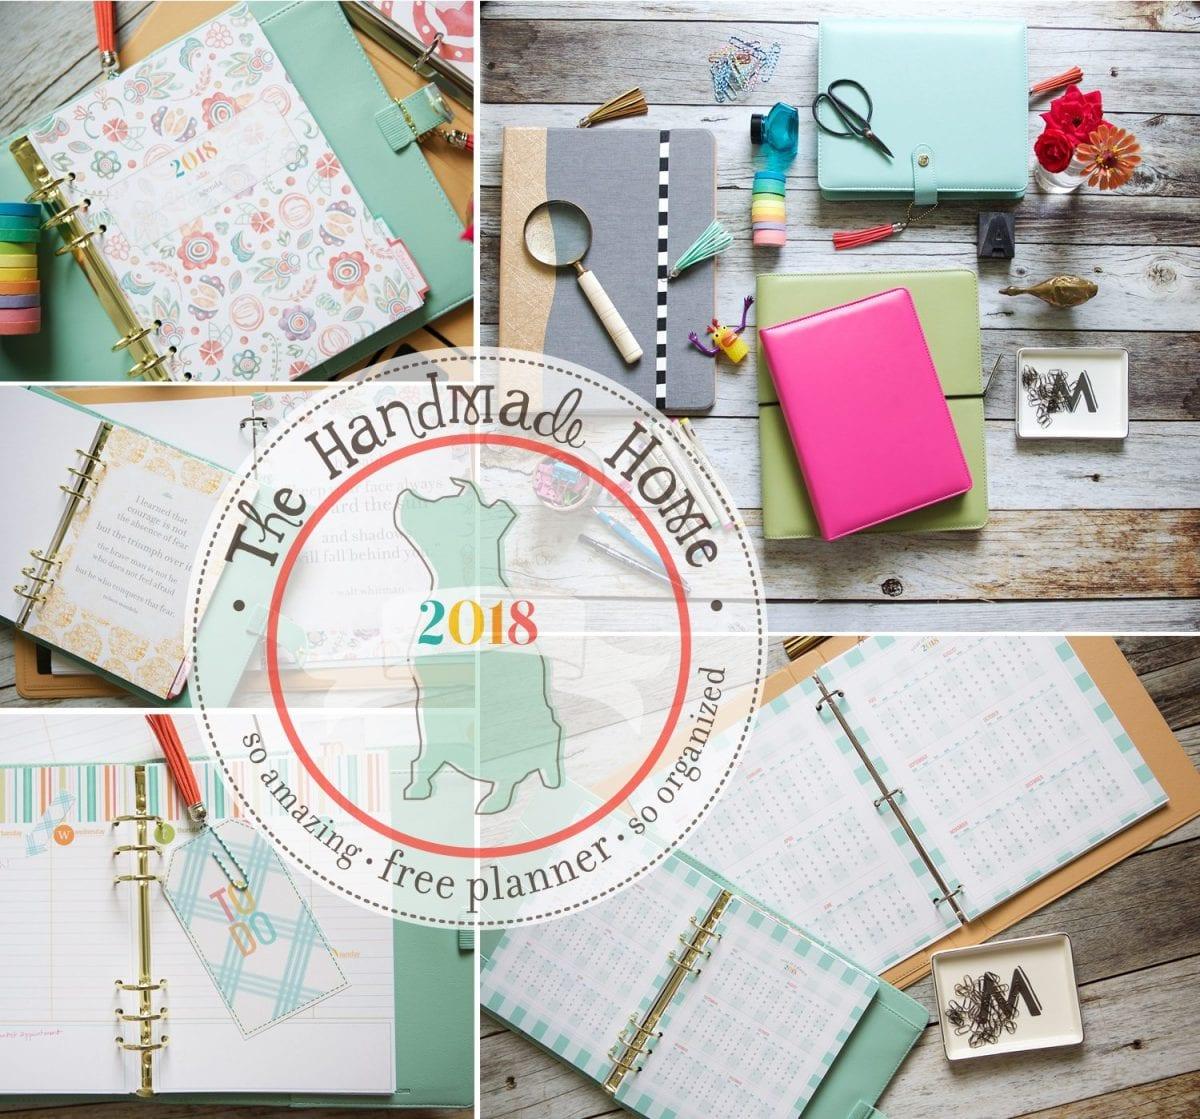 2018 free planner